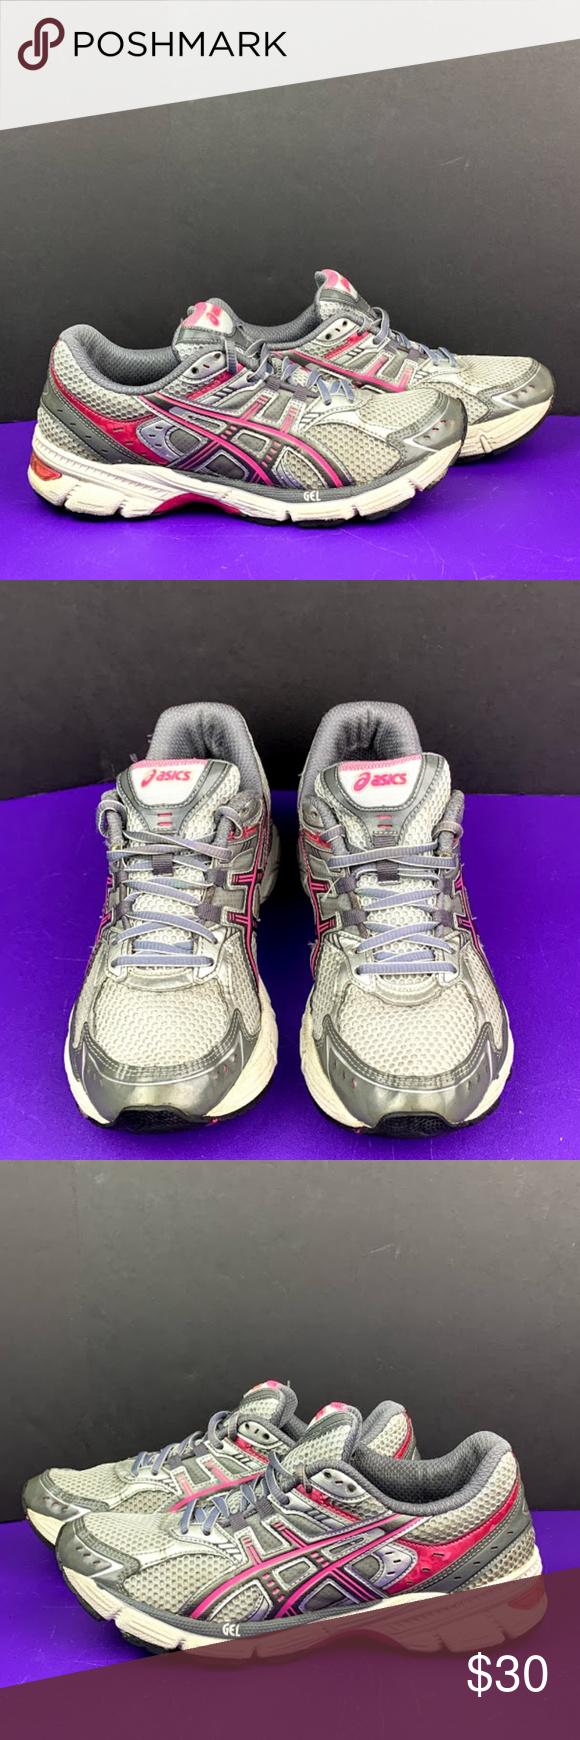 Women's Asics Gel Equation 5 Size 9 Running Shoes   Asics running ...